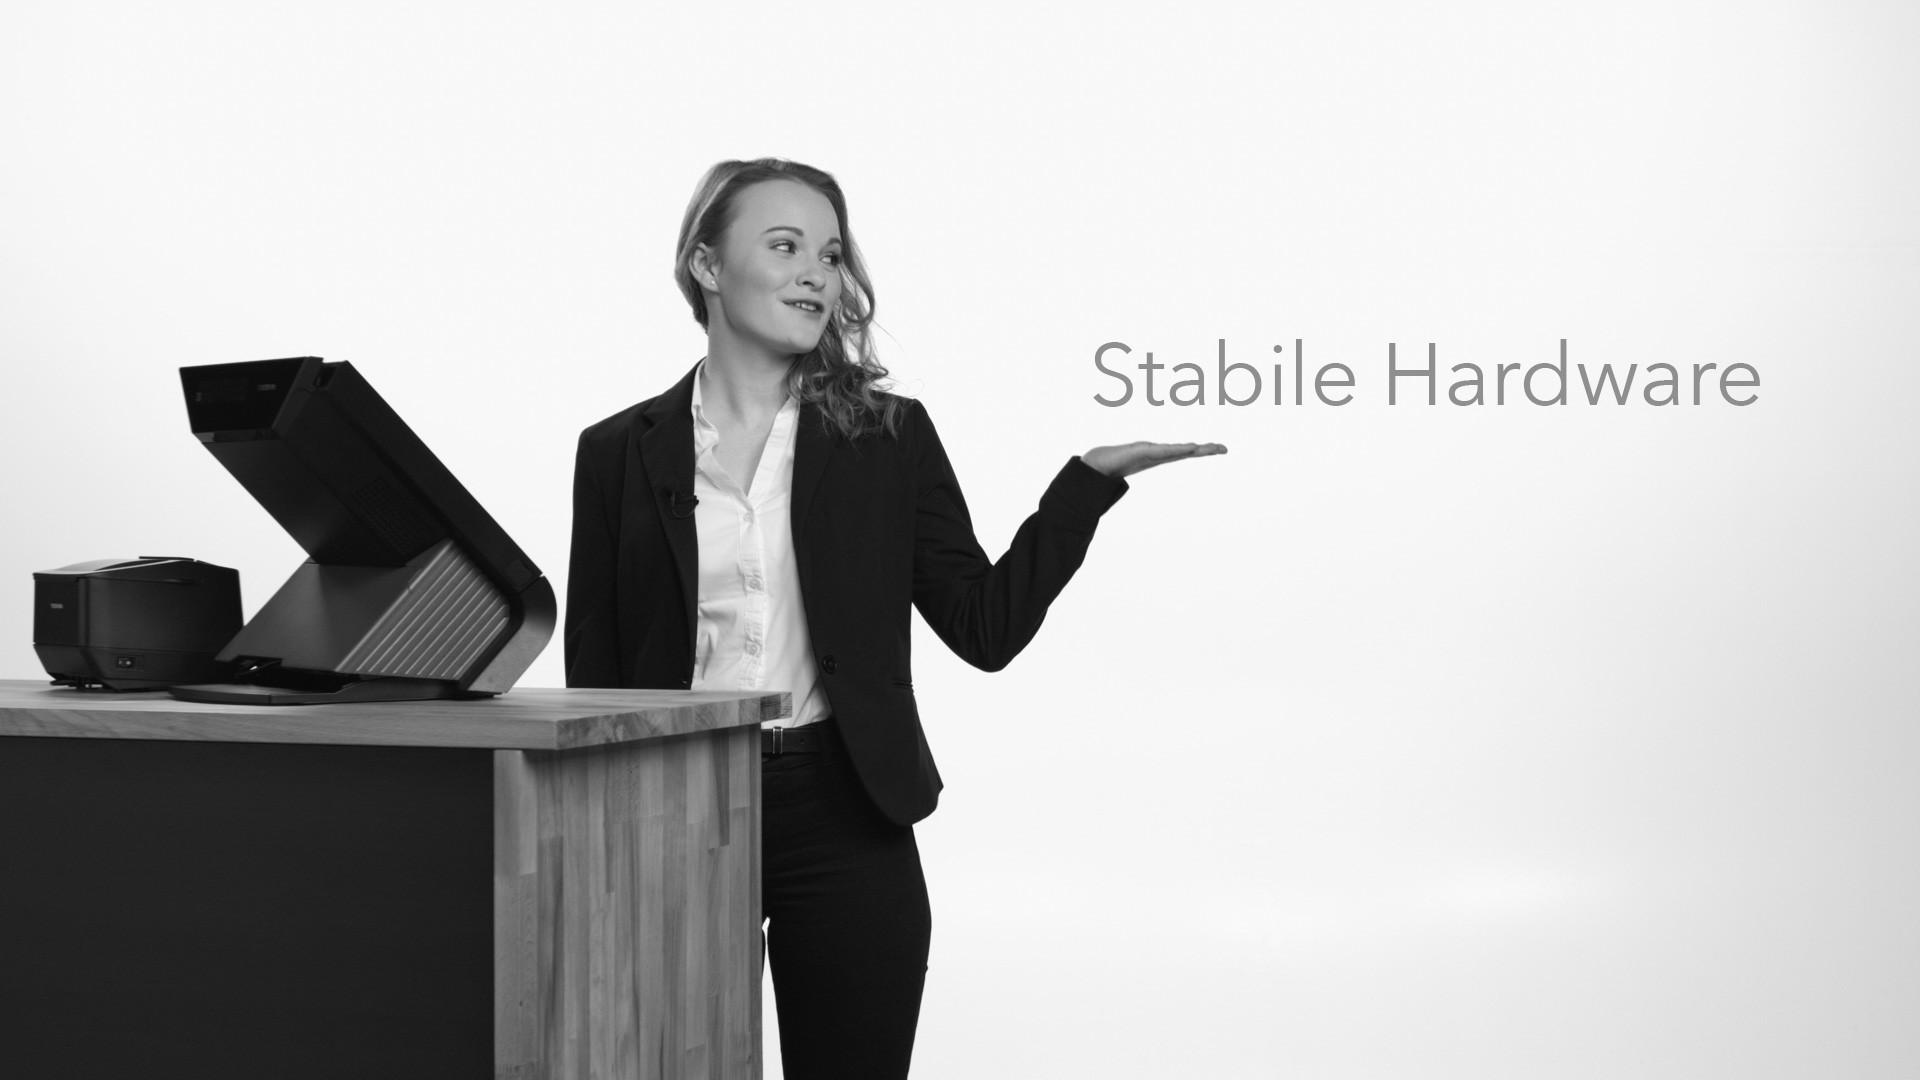 Kassensystem Produktvideo geht online